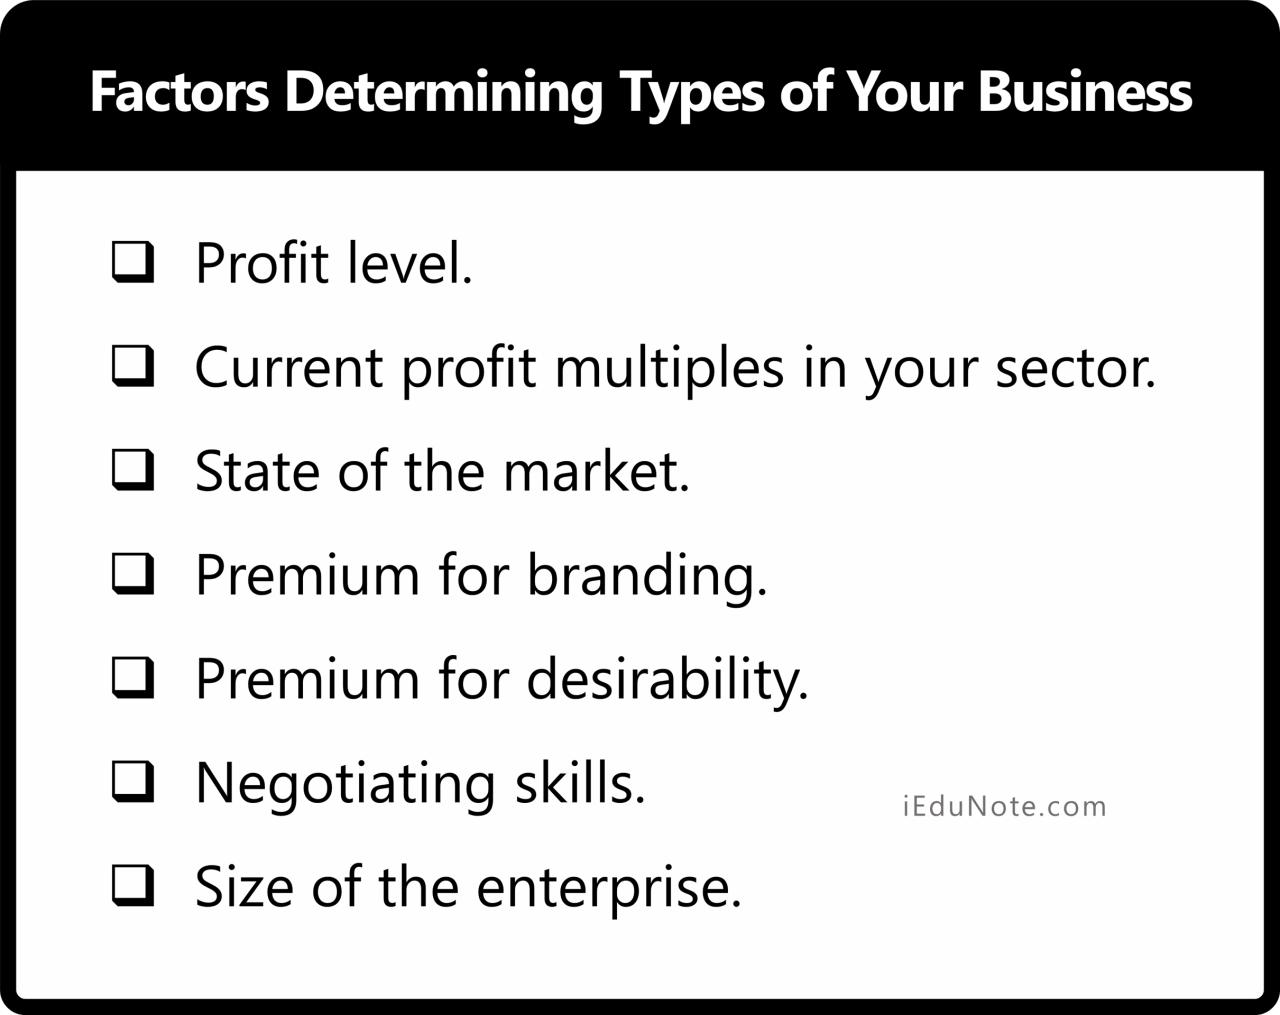 Factors Determining Types of Business